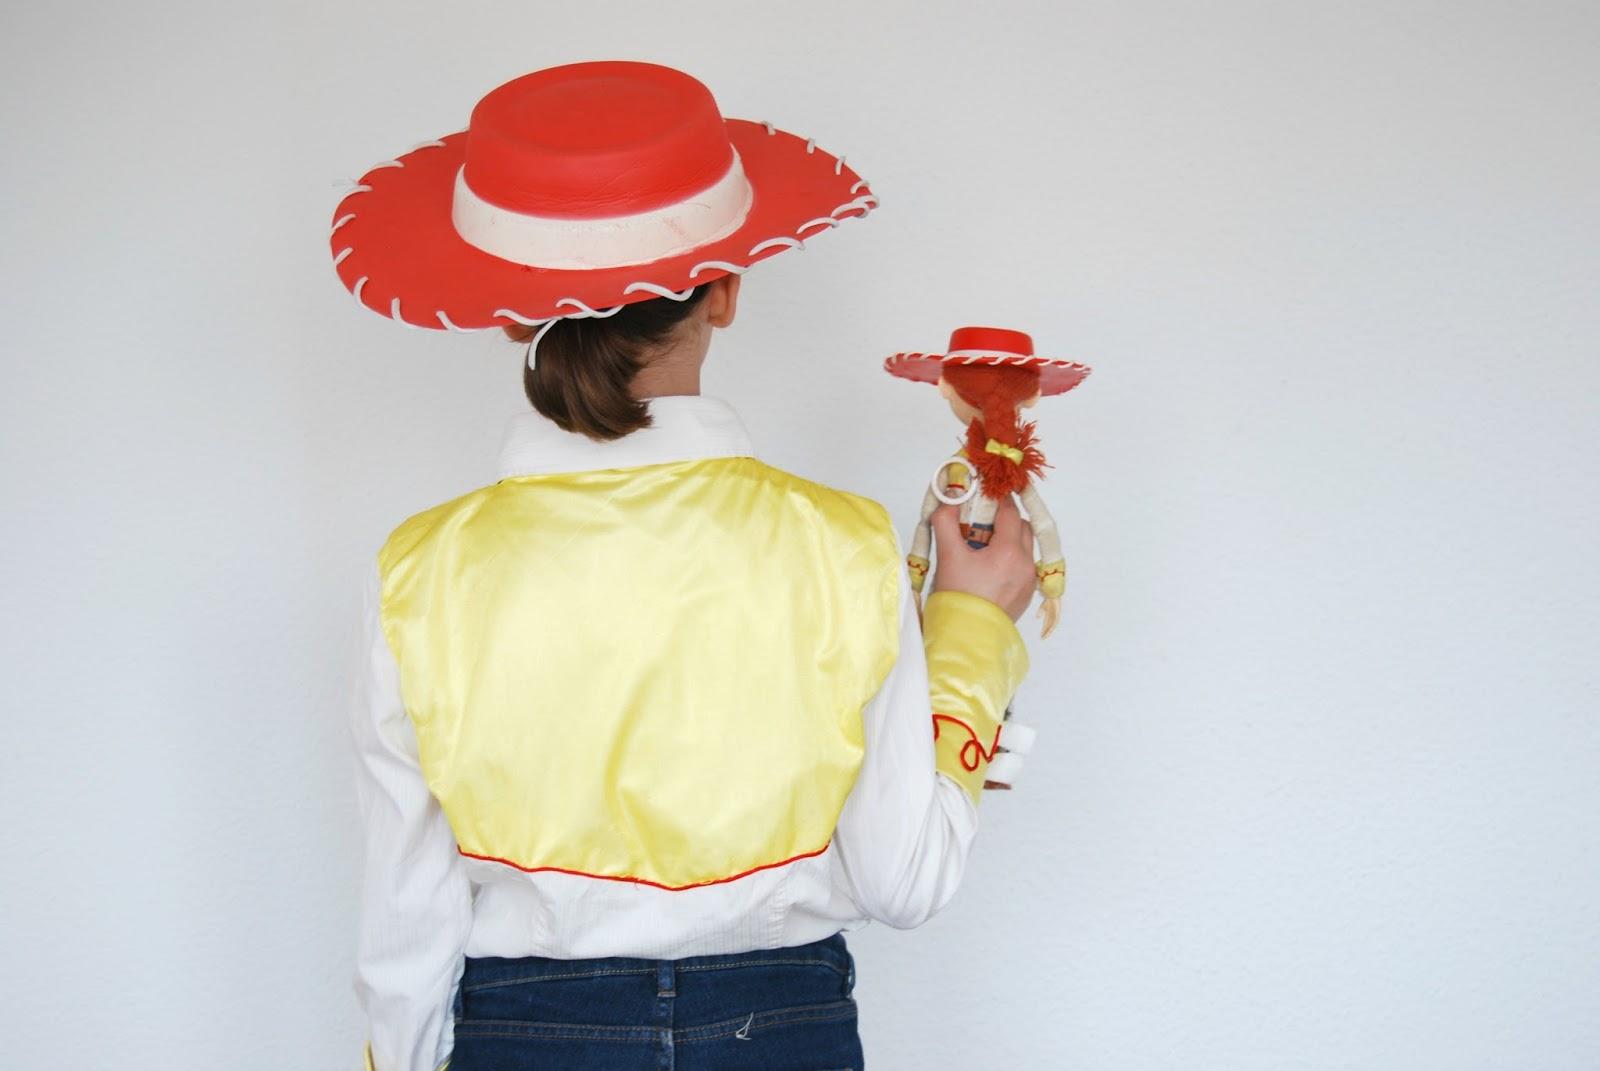 Disfraz jessie la vaquera hecho en casa handmade jessie from toy story  costume JPG 1600x1071 Disfraces f8eb91454cb